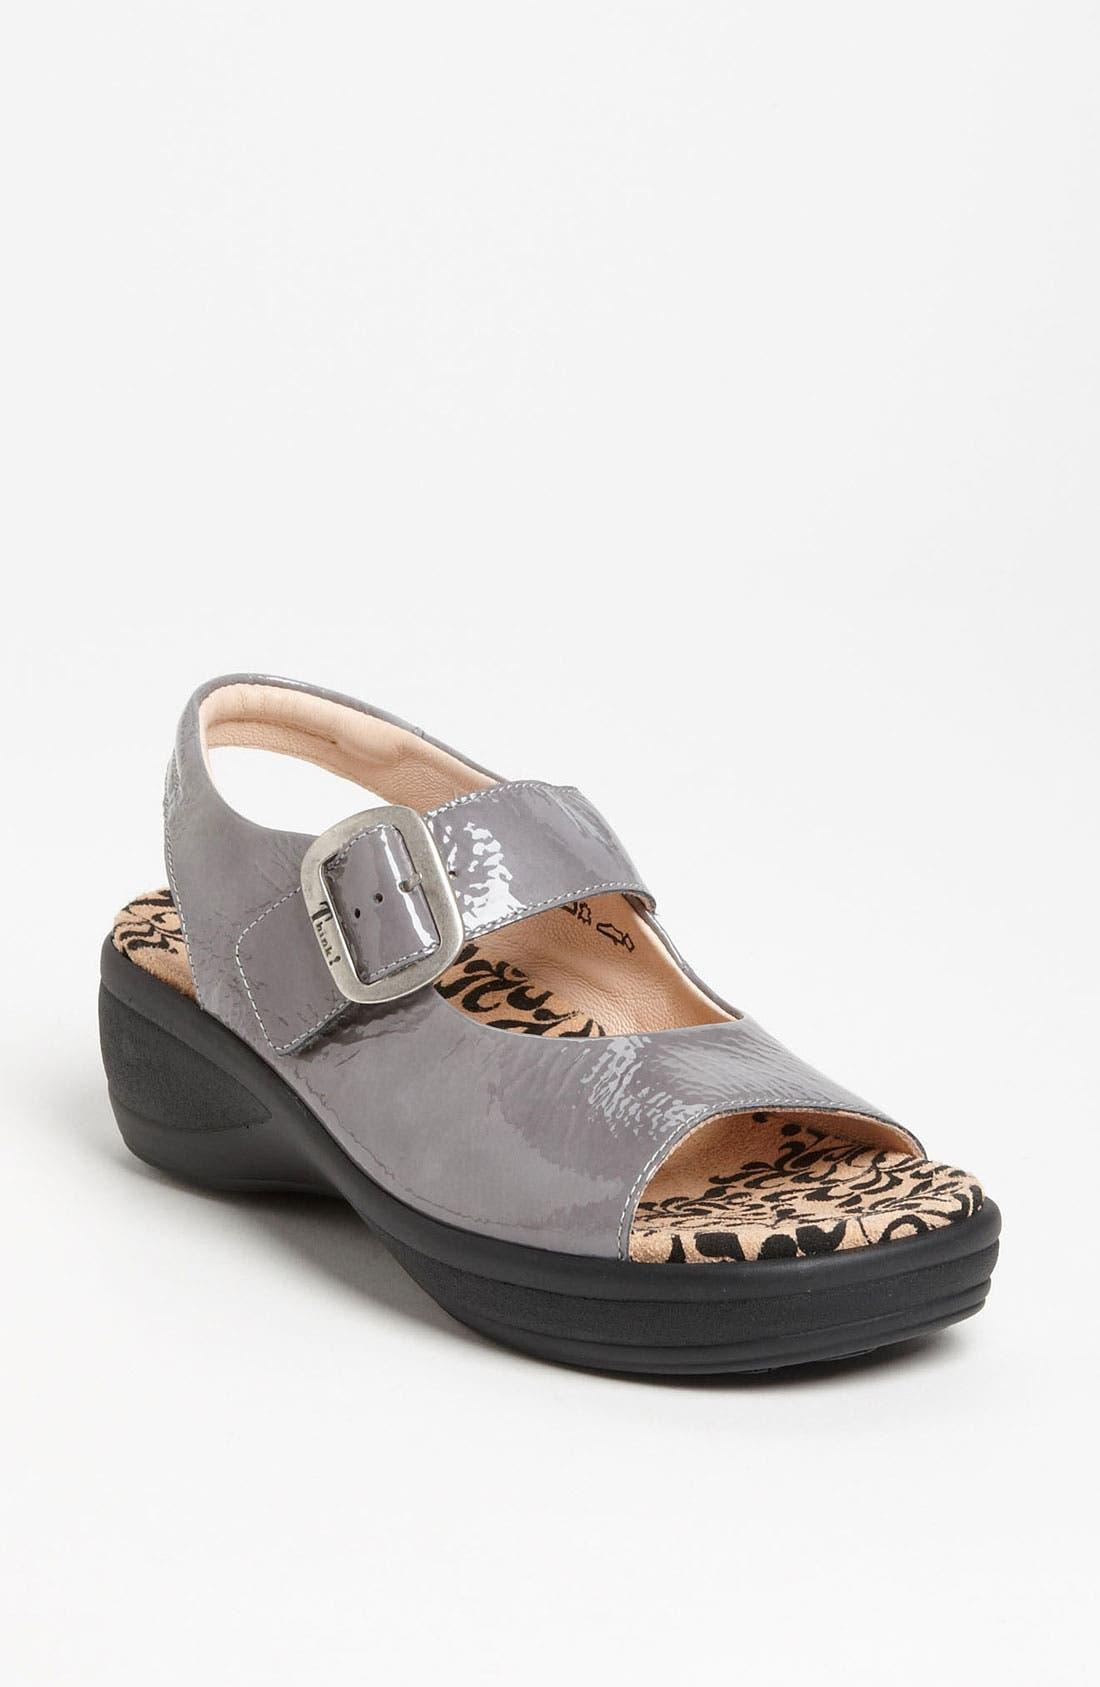 Alternate Image 1 Selected - Think! 'Breggal' Sandal (Online Only)